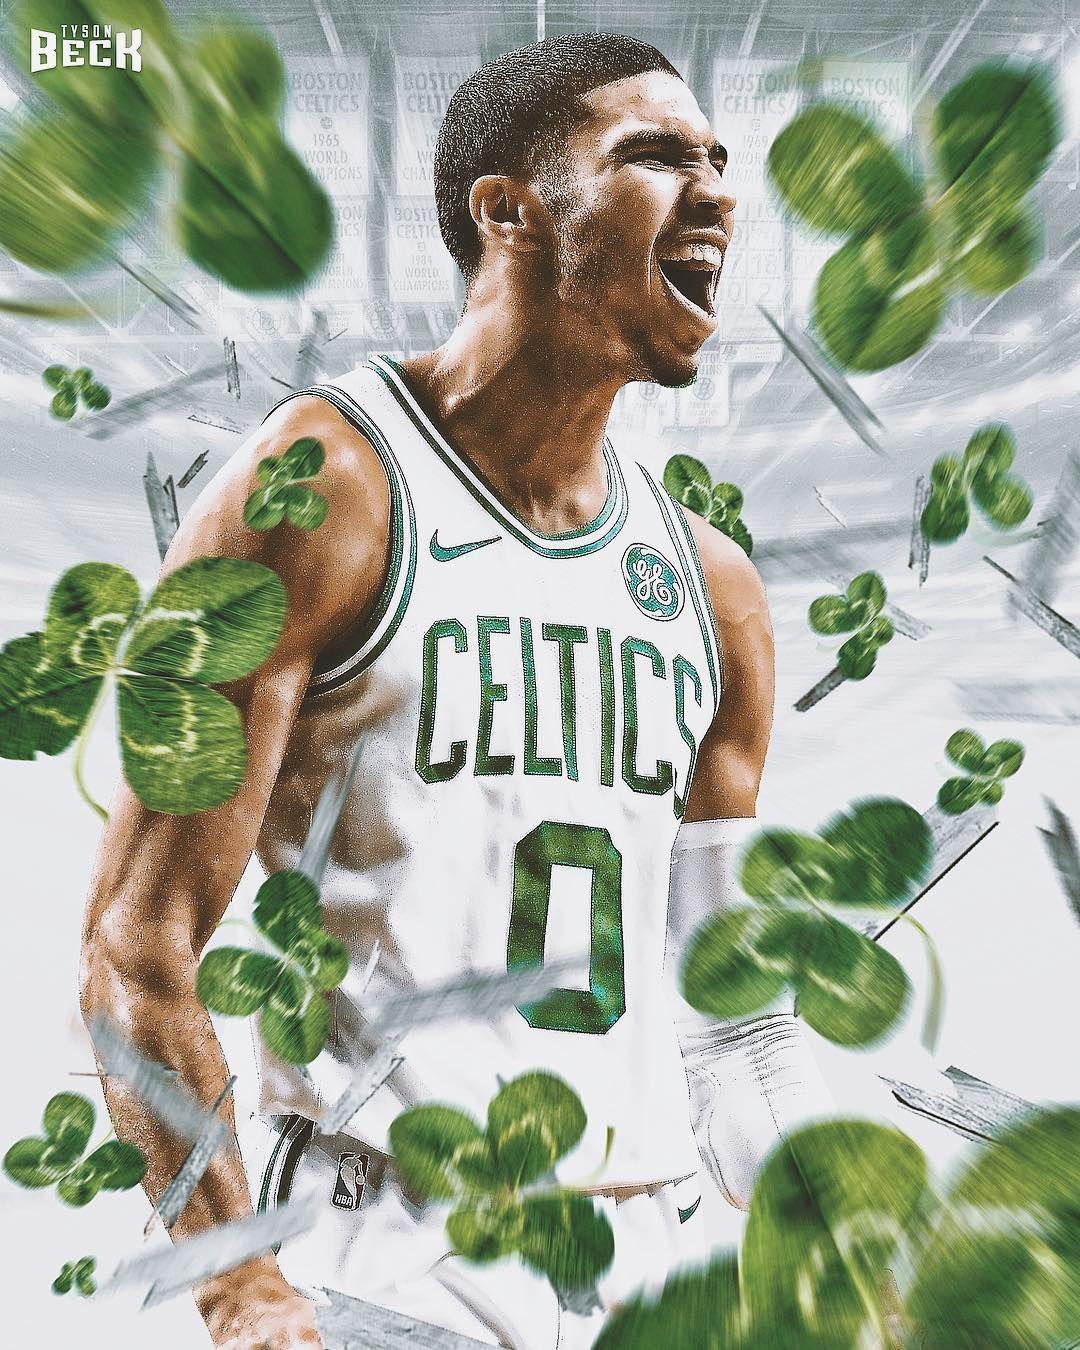 The Rookie Jayson Tatum Leads The Celtics To A Game 5 Win 1 Win Away From A Trip To The Nba Fin Jayson Tatum Boston Celtics Wallpaper Nba Basketball Art